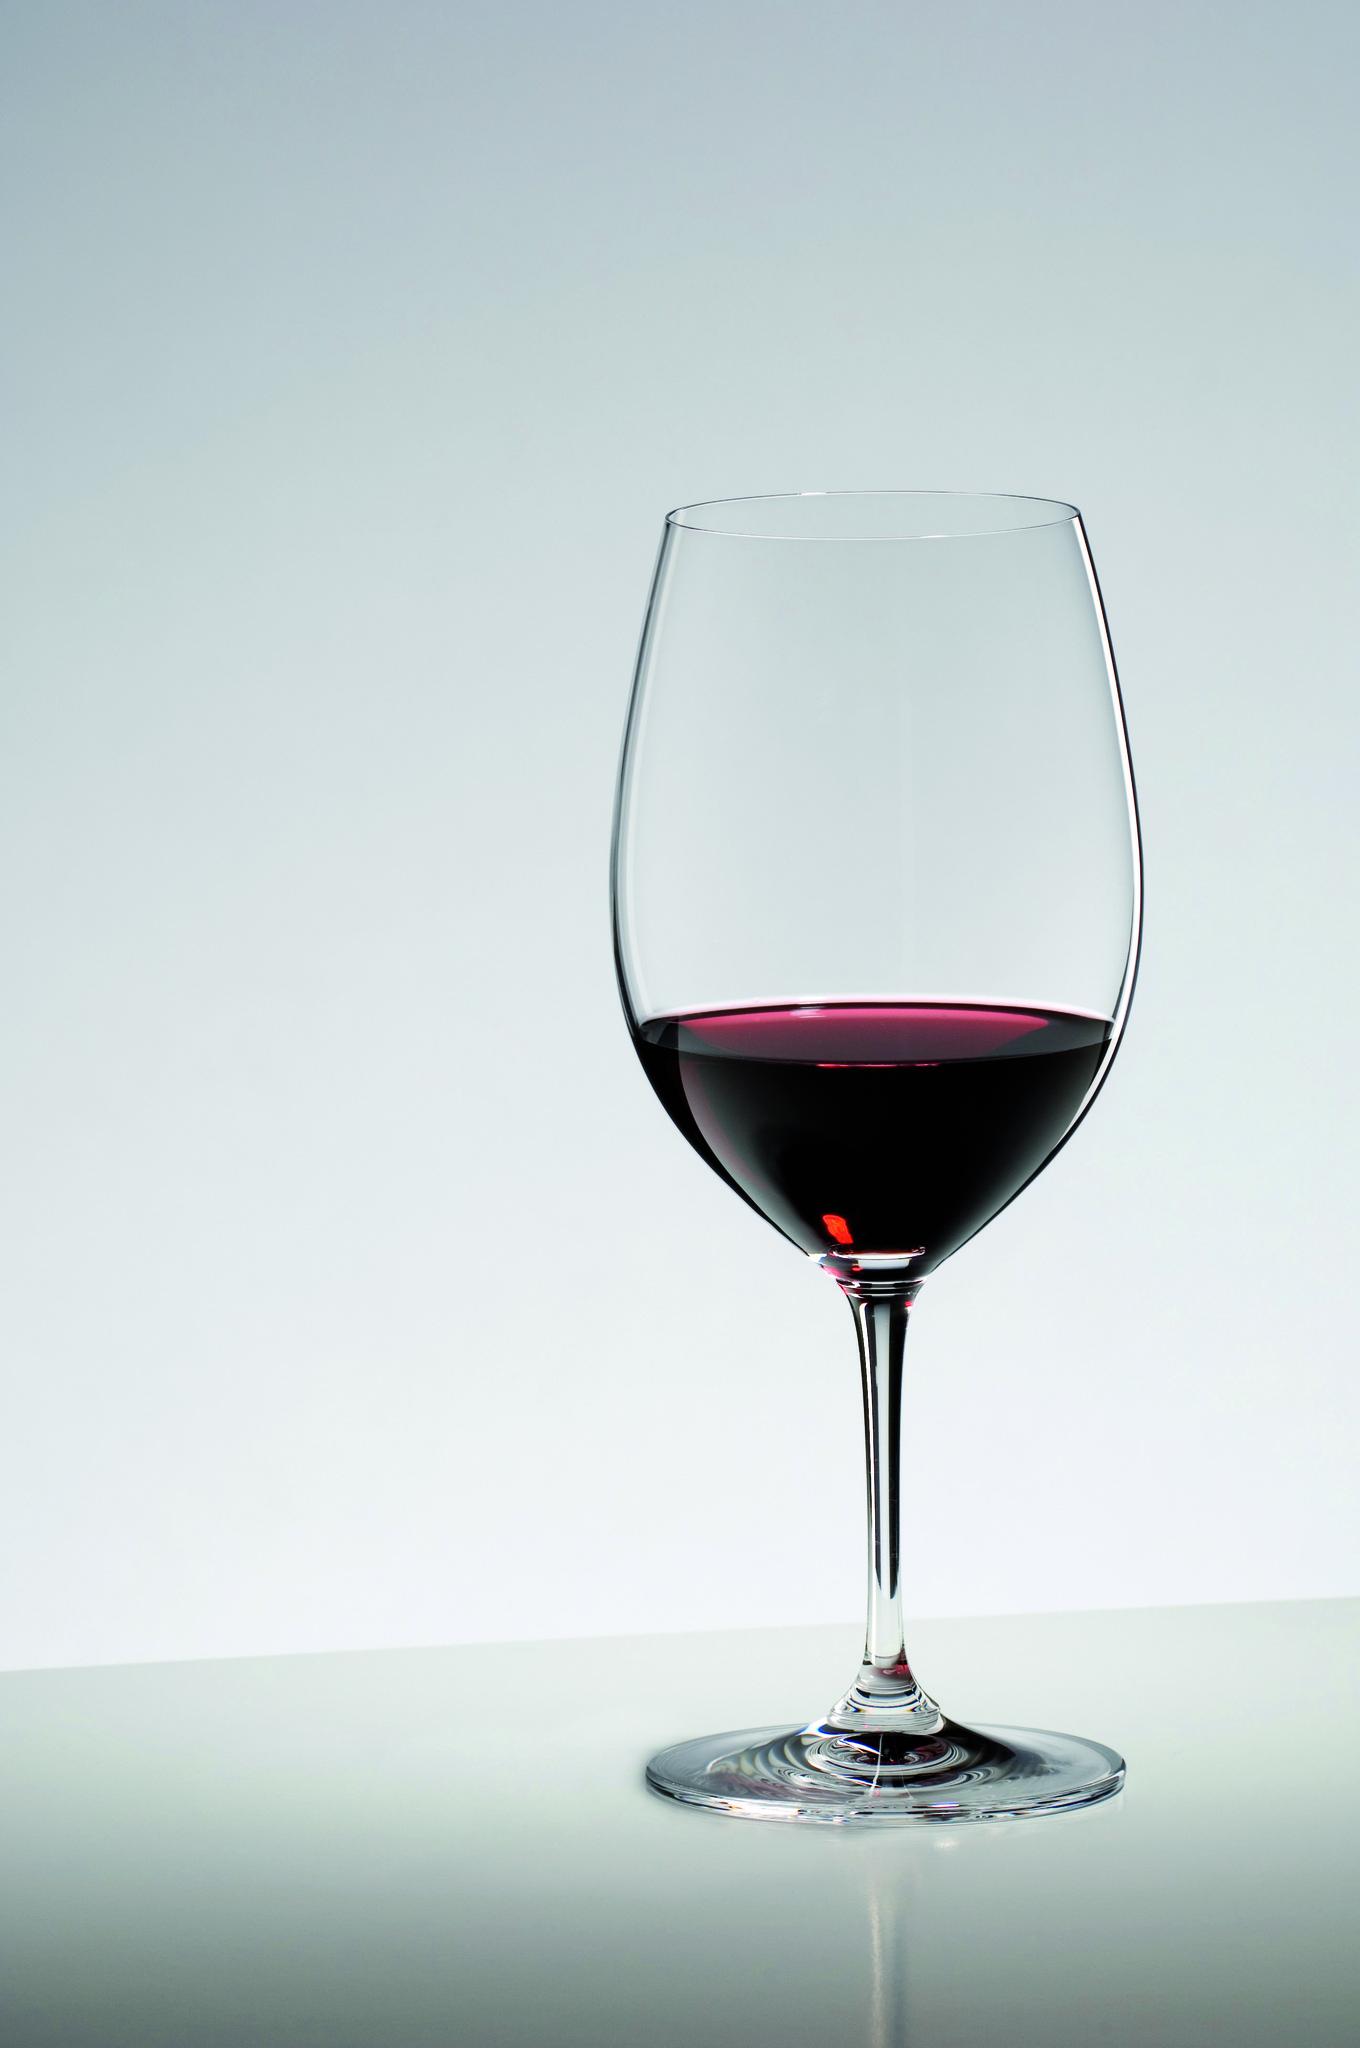 Бокалы Набор бокалов для красного вина 2шт 610мл Riedel Vinum Bordeaux nabor-bokalov-dlya-krasnogo-vina-2-sht-610-ml-riedel-vinum-bordeaux-avstriya.jpg